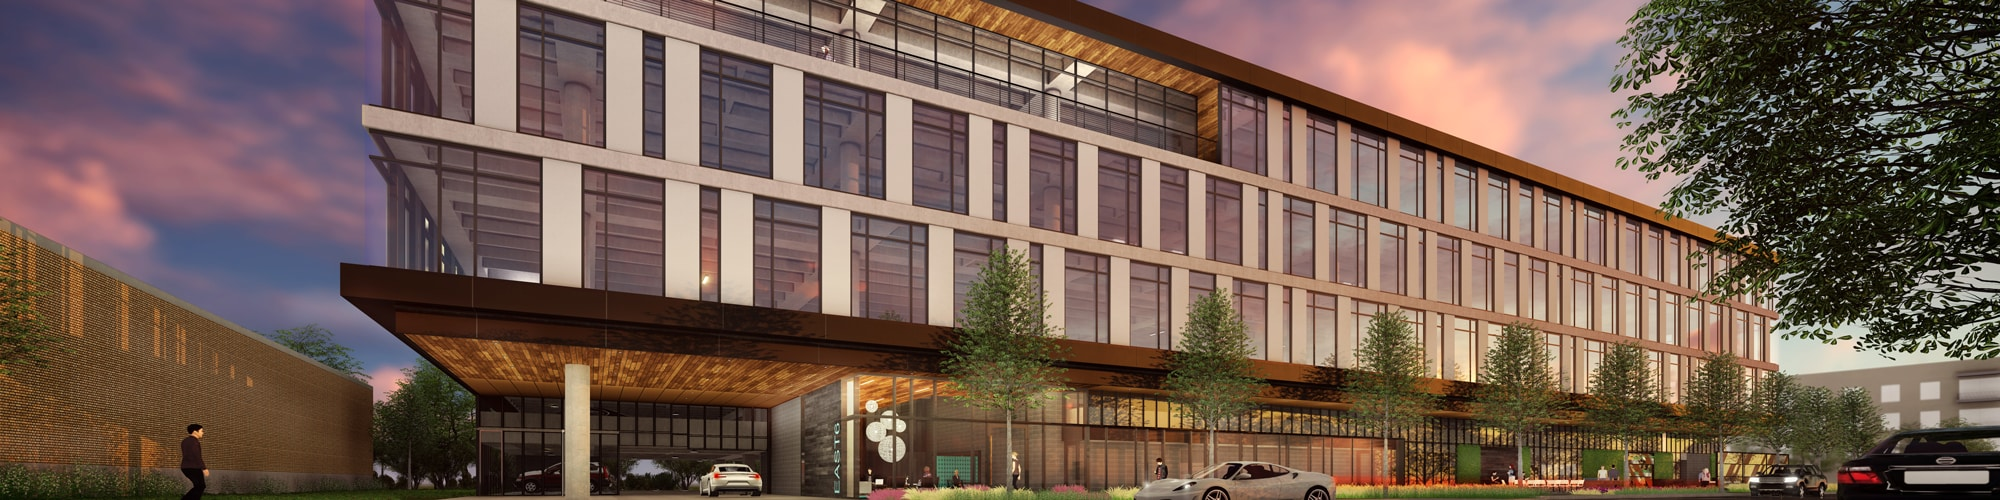 Main Street Hub East Austin HQ | AQUILA Tenant Rep Case Study